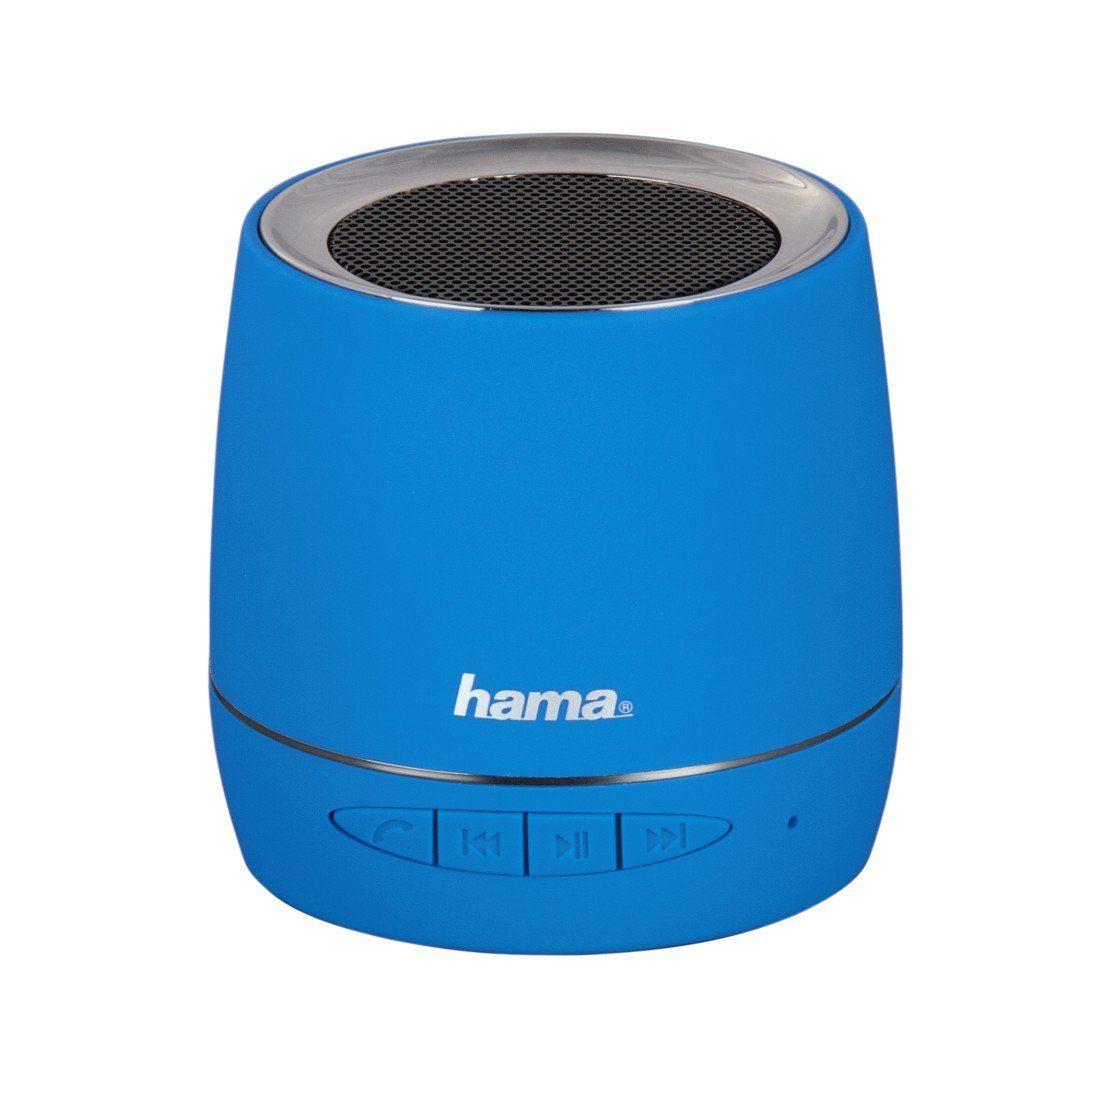 Hama Mobiler Bluetooth-Lautsprecher, Blau